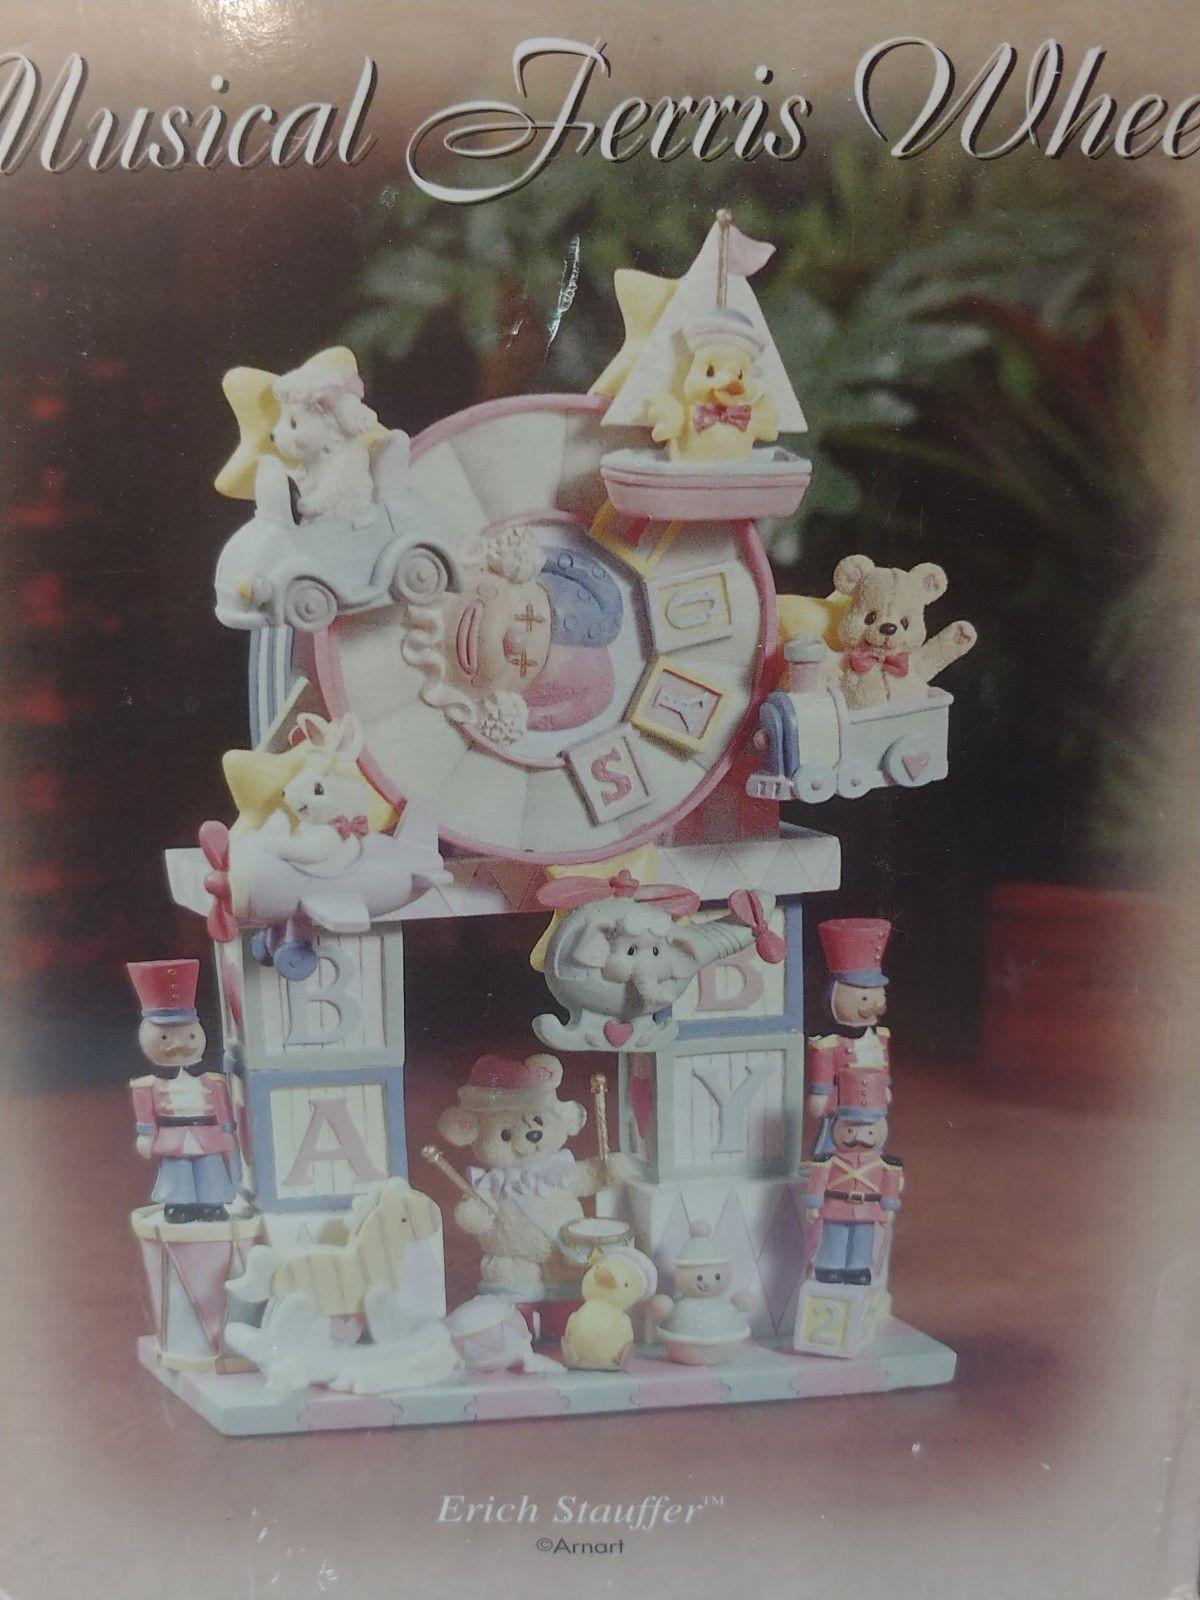 Nursery Musical Ferris Wheel Erich Stauffer Arnart NEW in Box